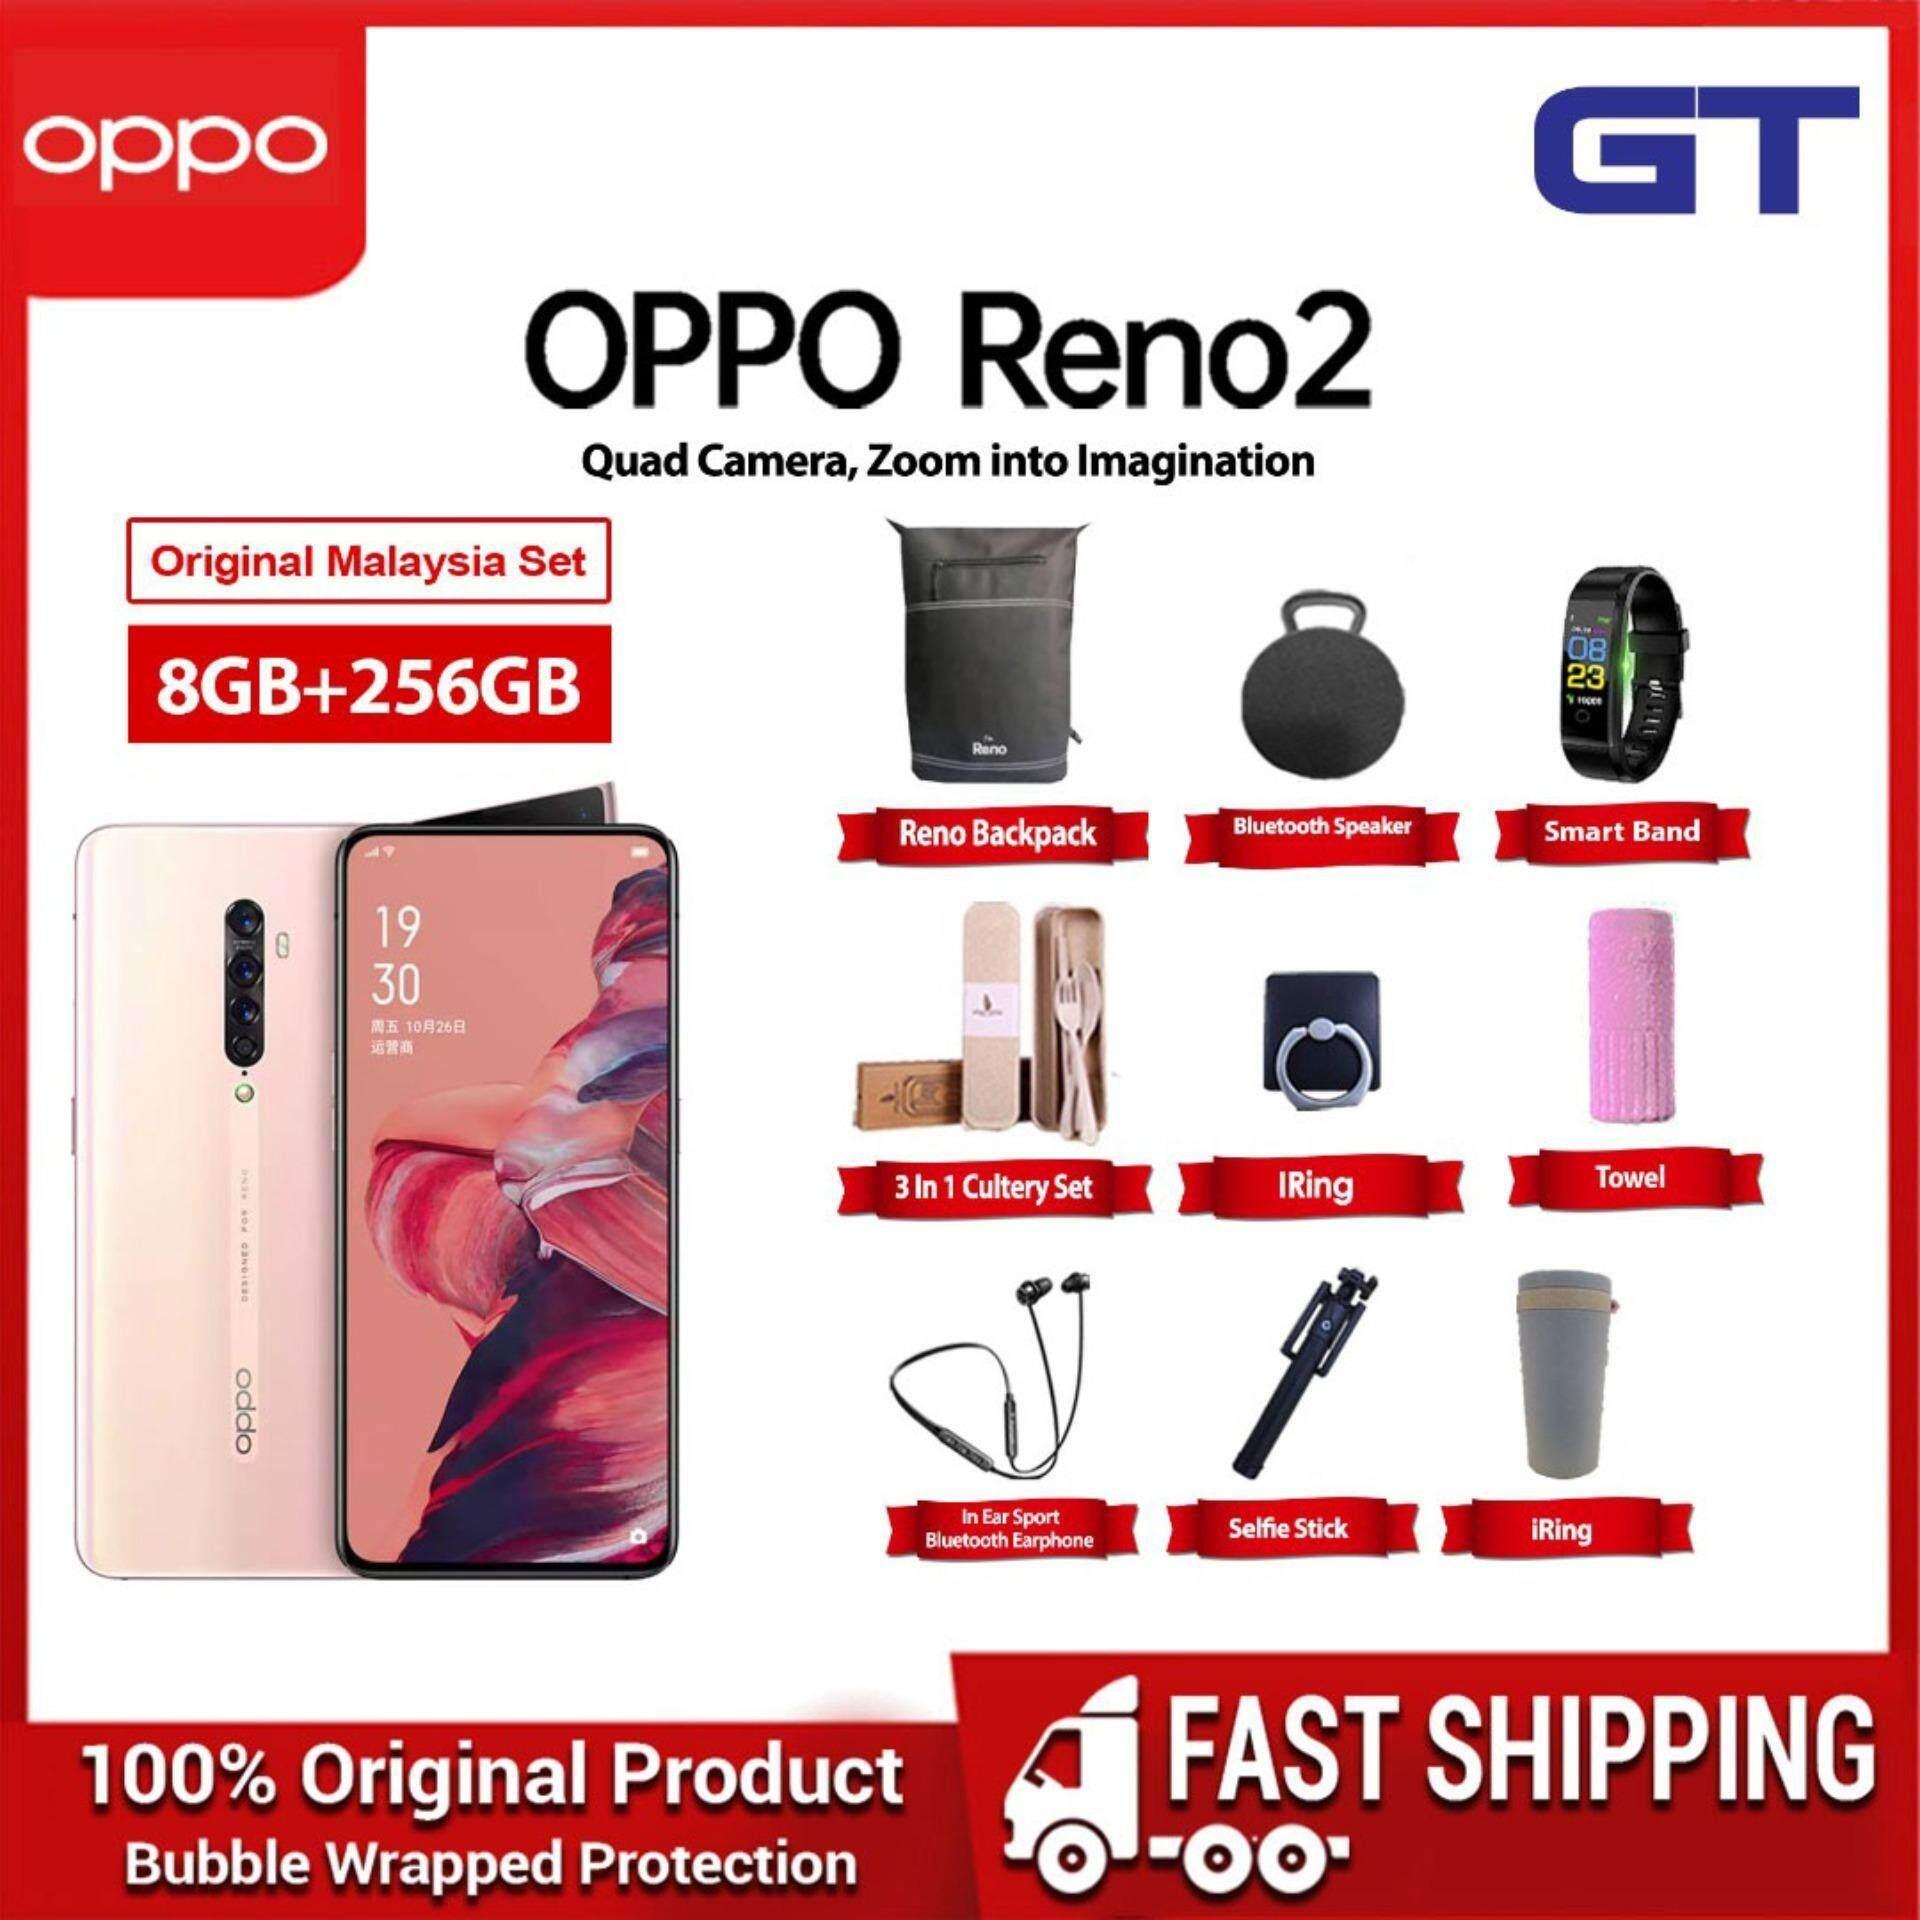 [12 12 Sale] [ Ready Stock ] Oppo Reno 2 handphone ( 8GB + 256GB Rom ) 1  Year Warranty By Oppo Malatsia